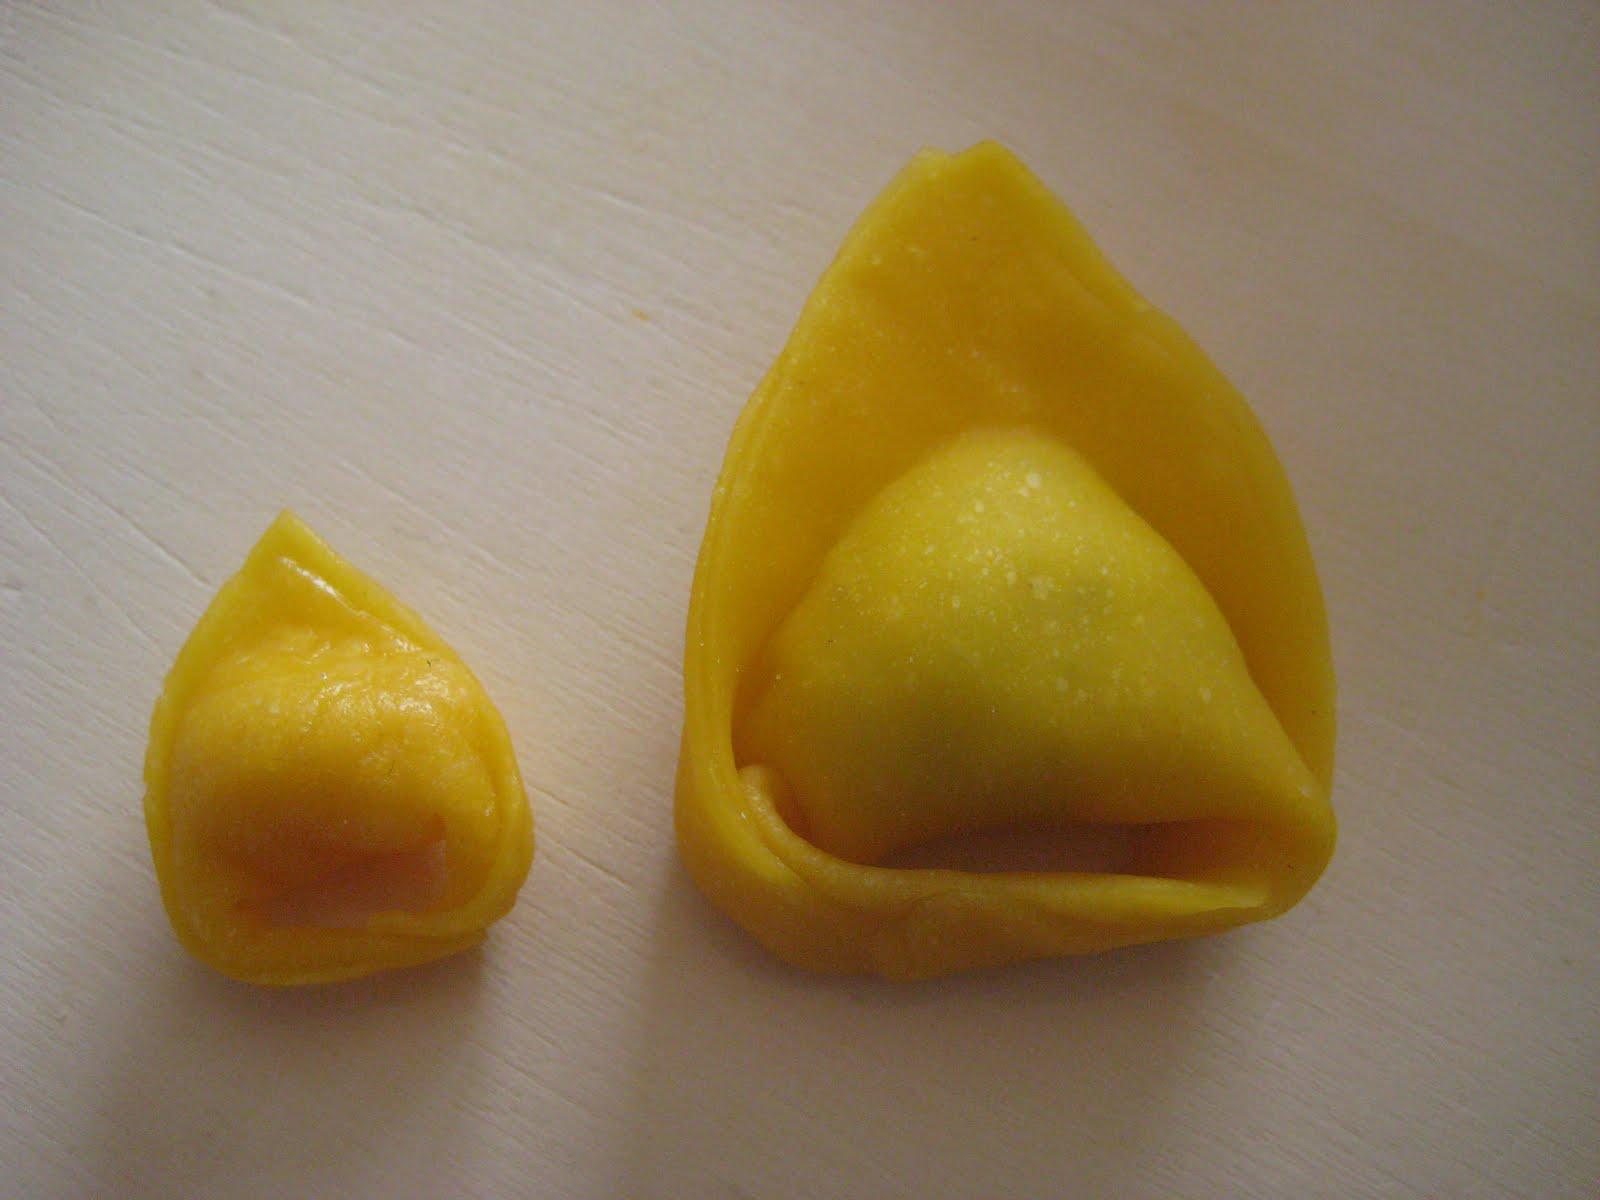 Taste of Italy: Tortellino vs Tortelloni